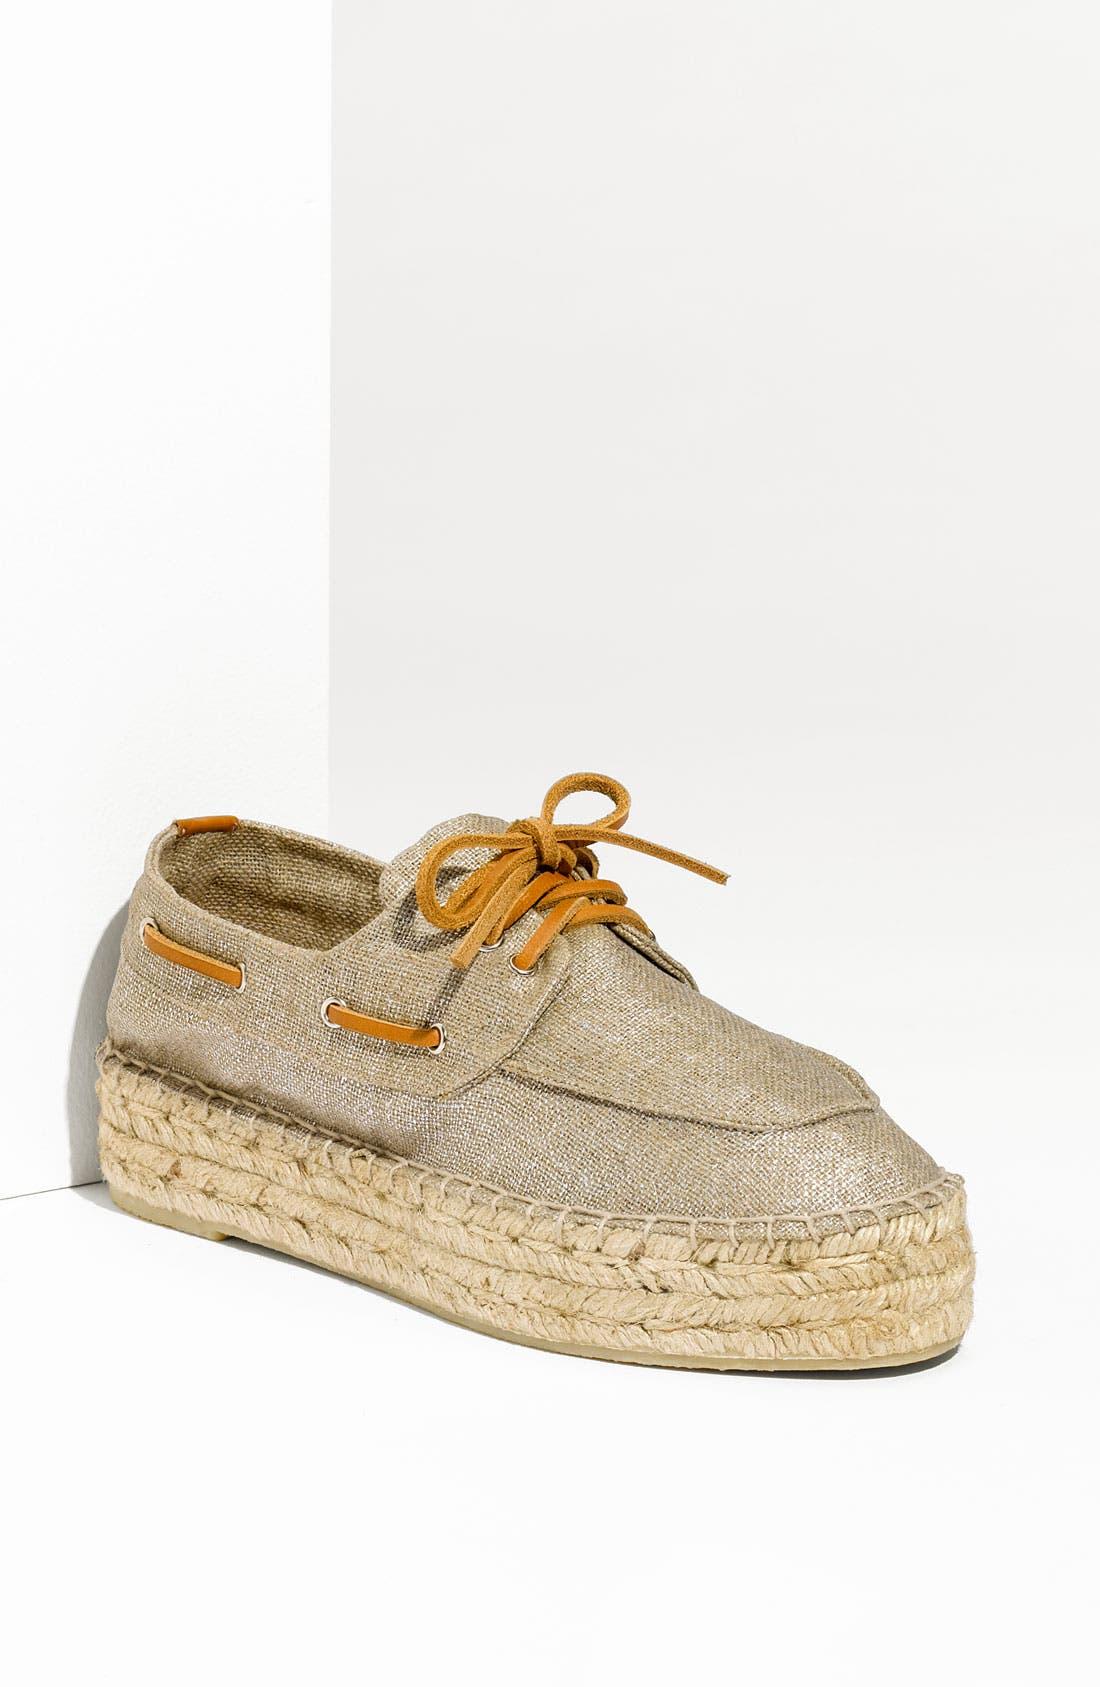 TORY BURCH Boat Shoe Espadrille, Main, color, 040